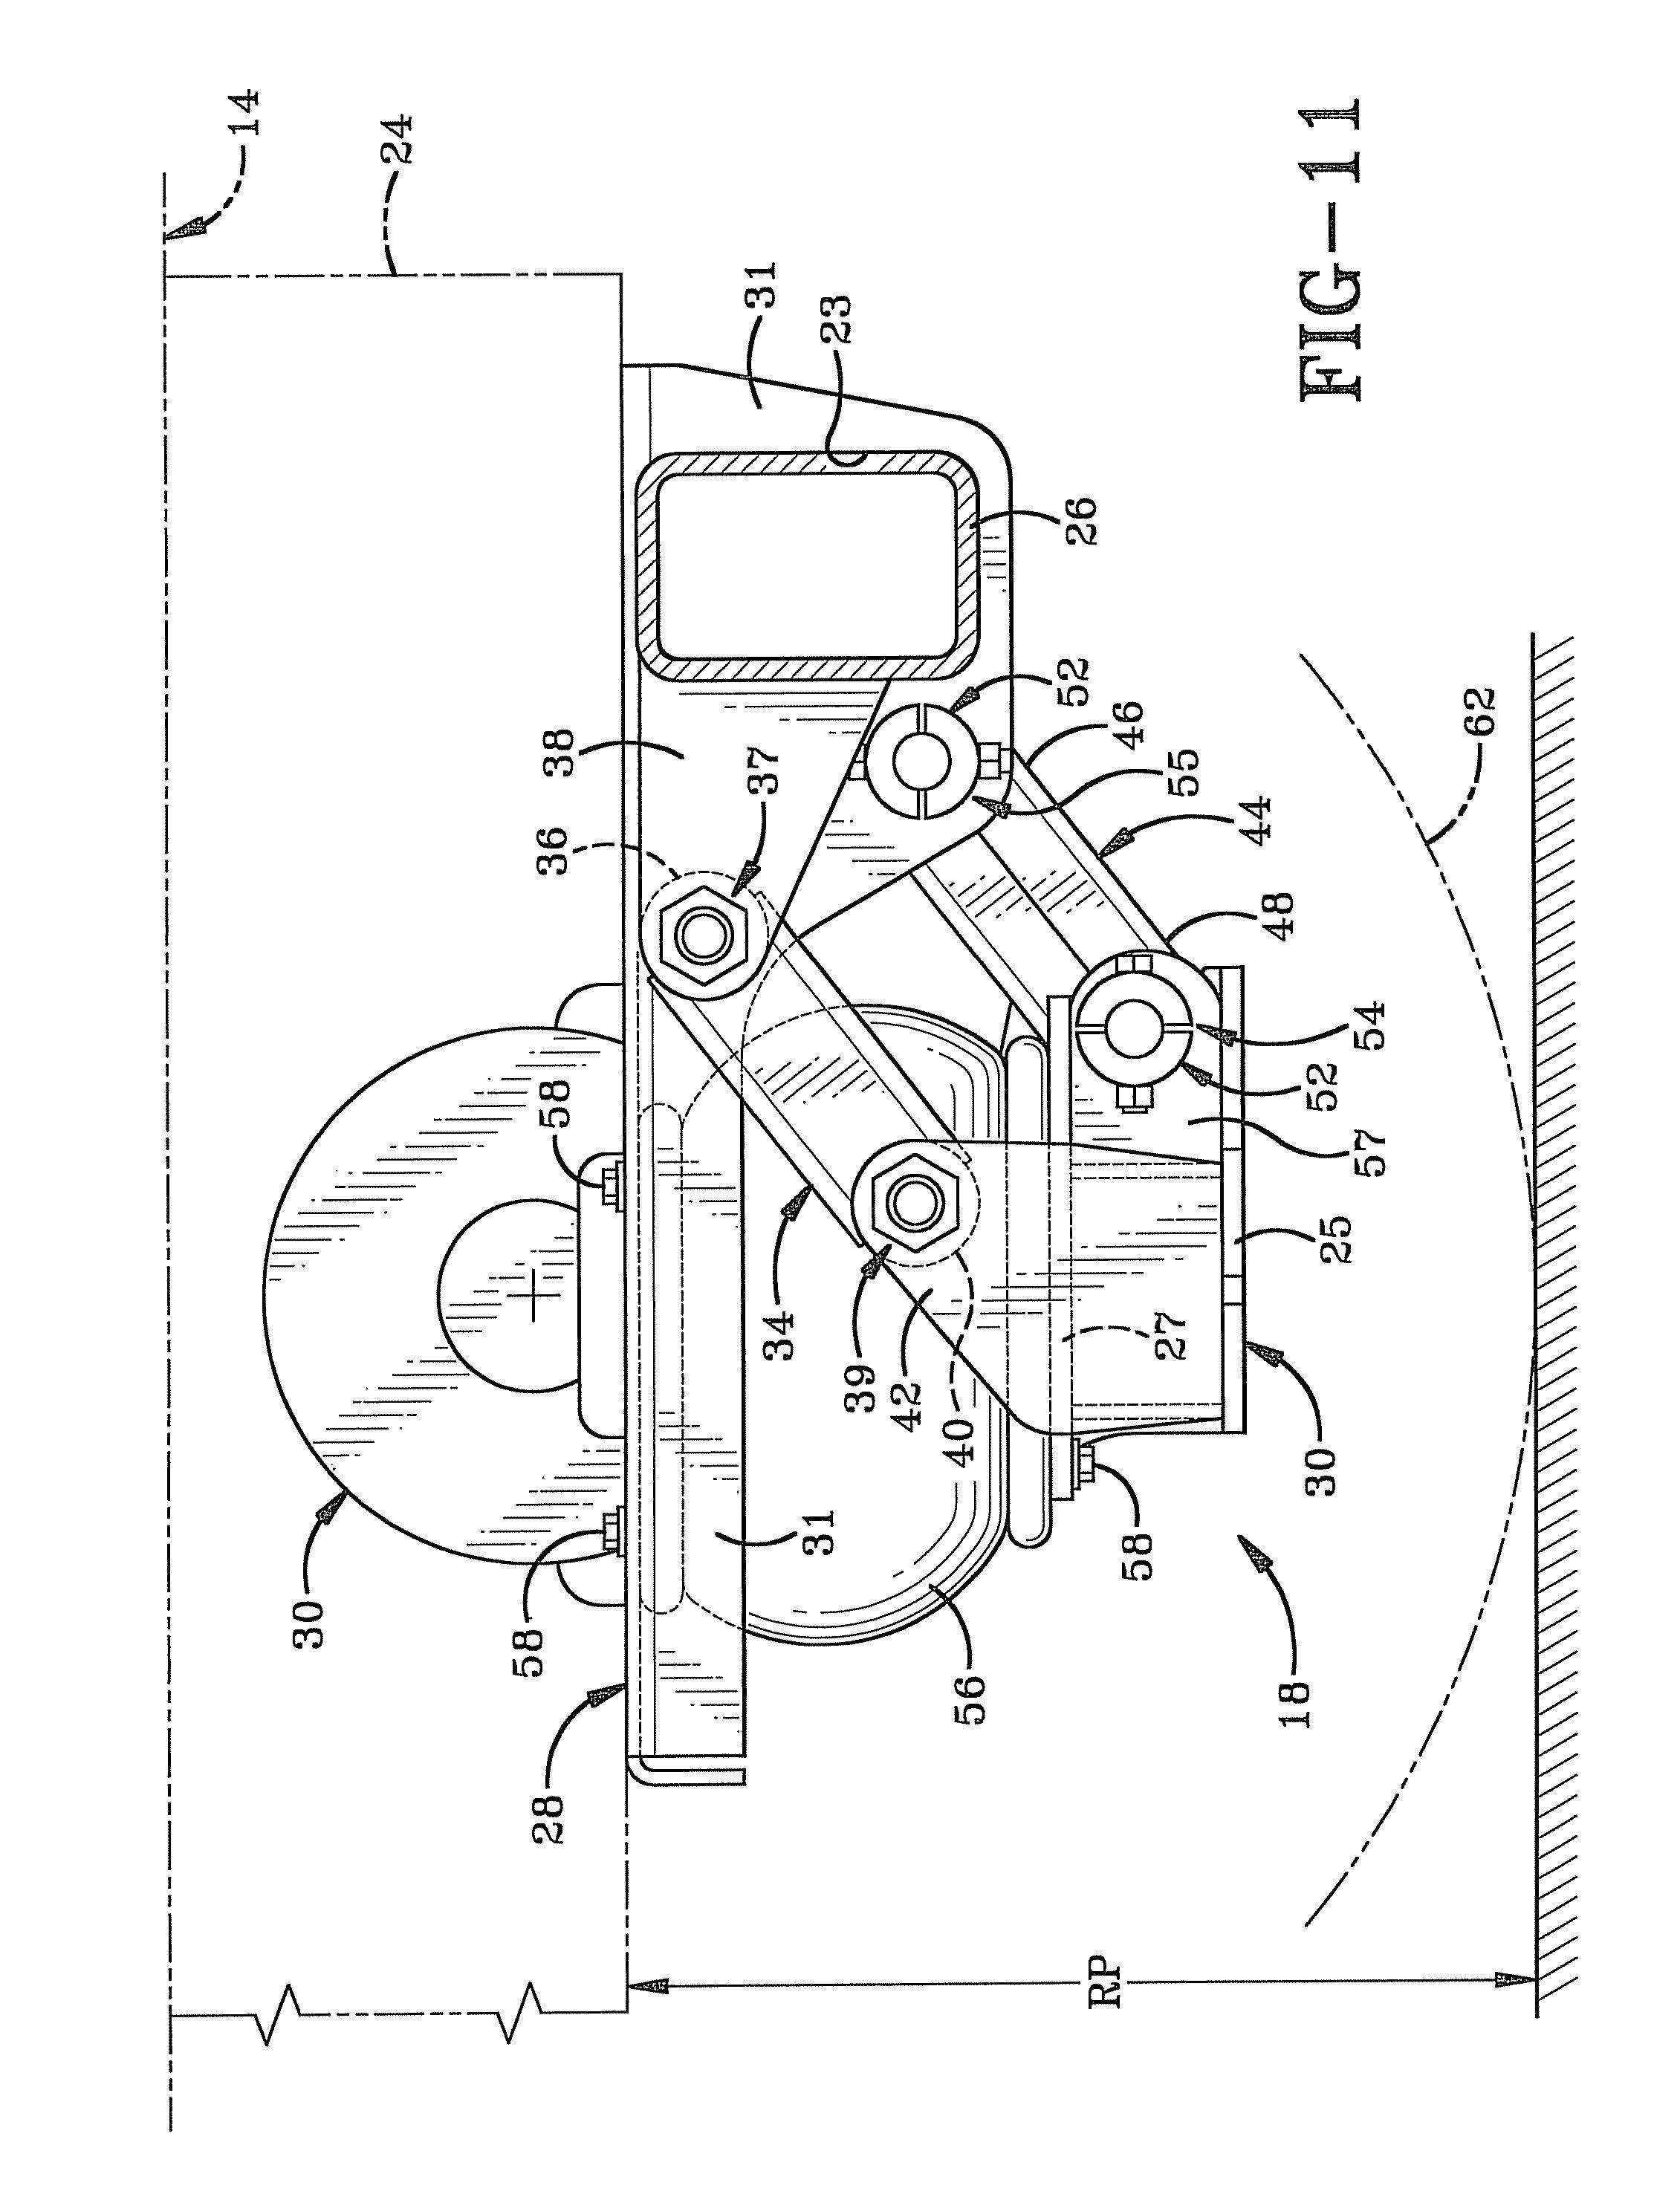 Patent Us8220809 Independent Parallelogram Suspension